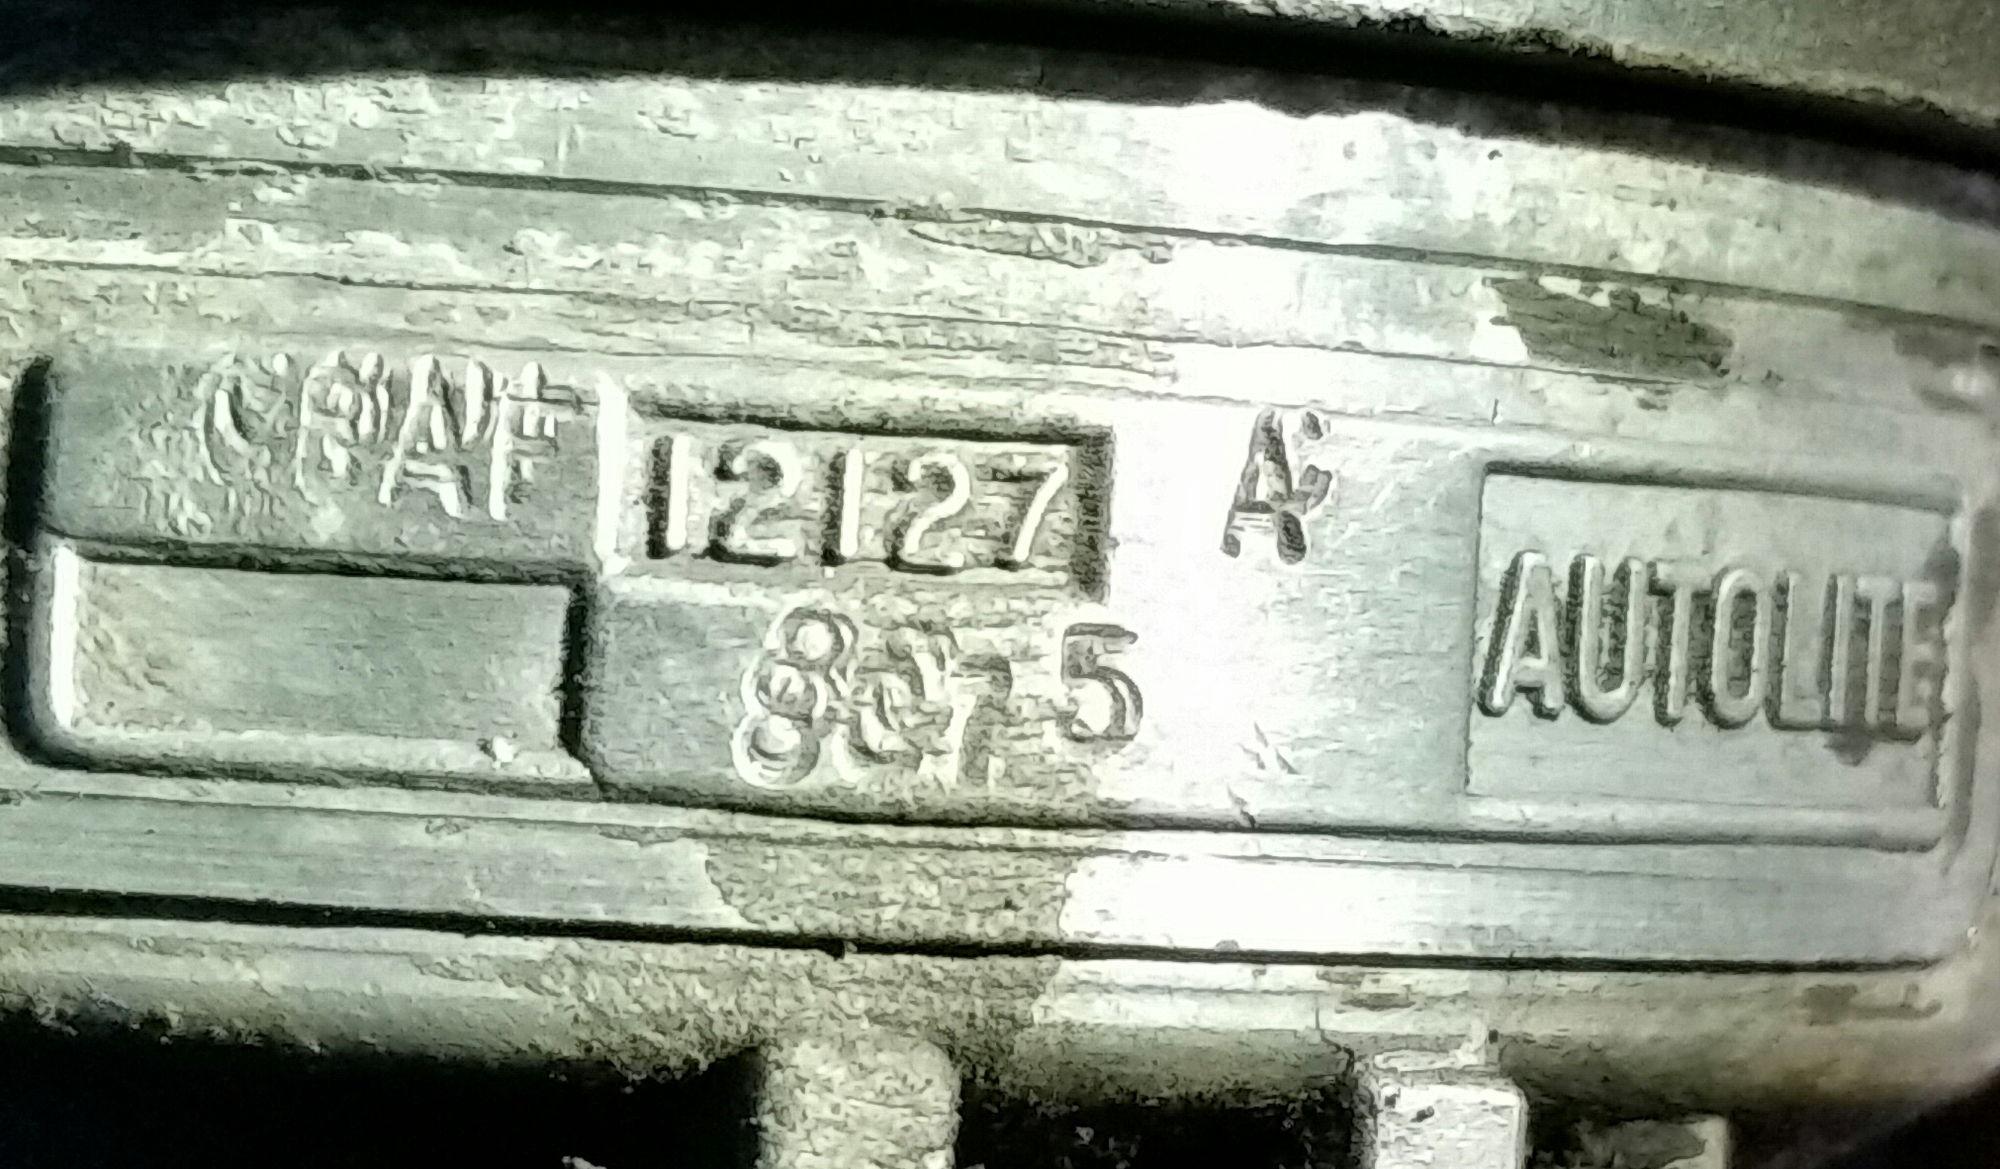 Used Cars Binghamton Ny >> Help identifying Autolite Distributor - Ford Truck